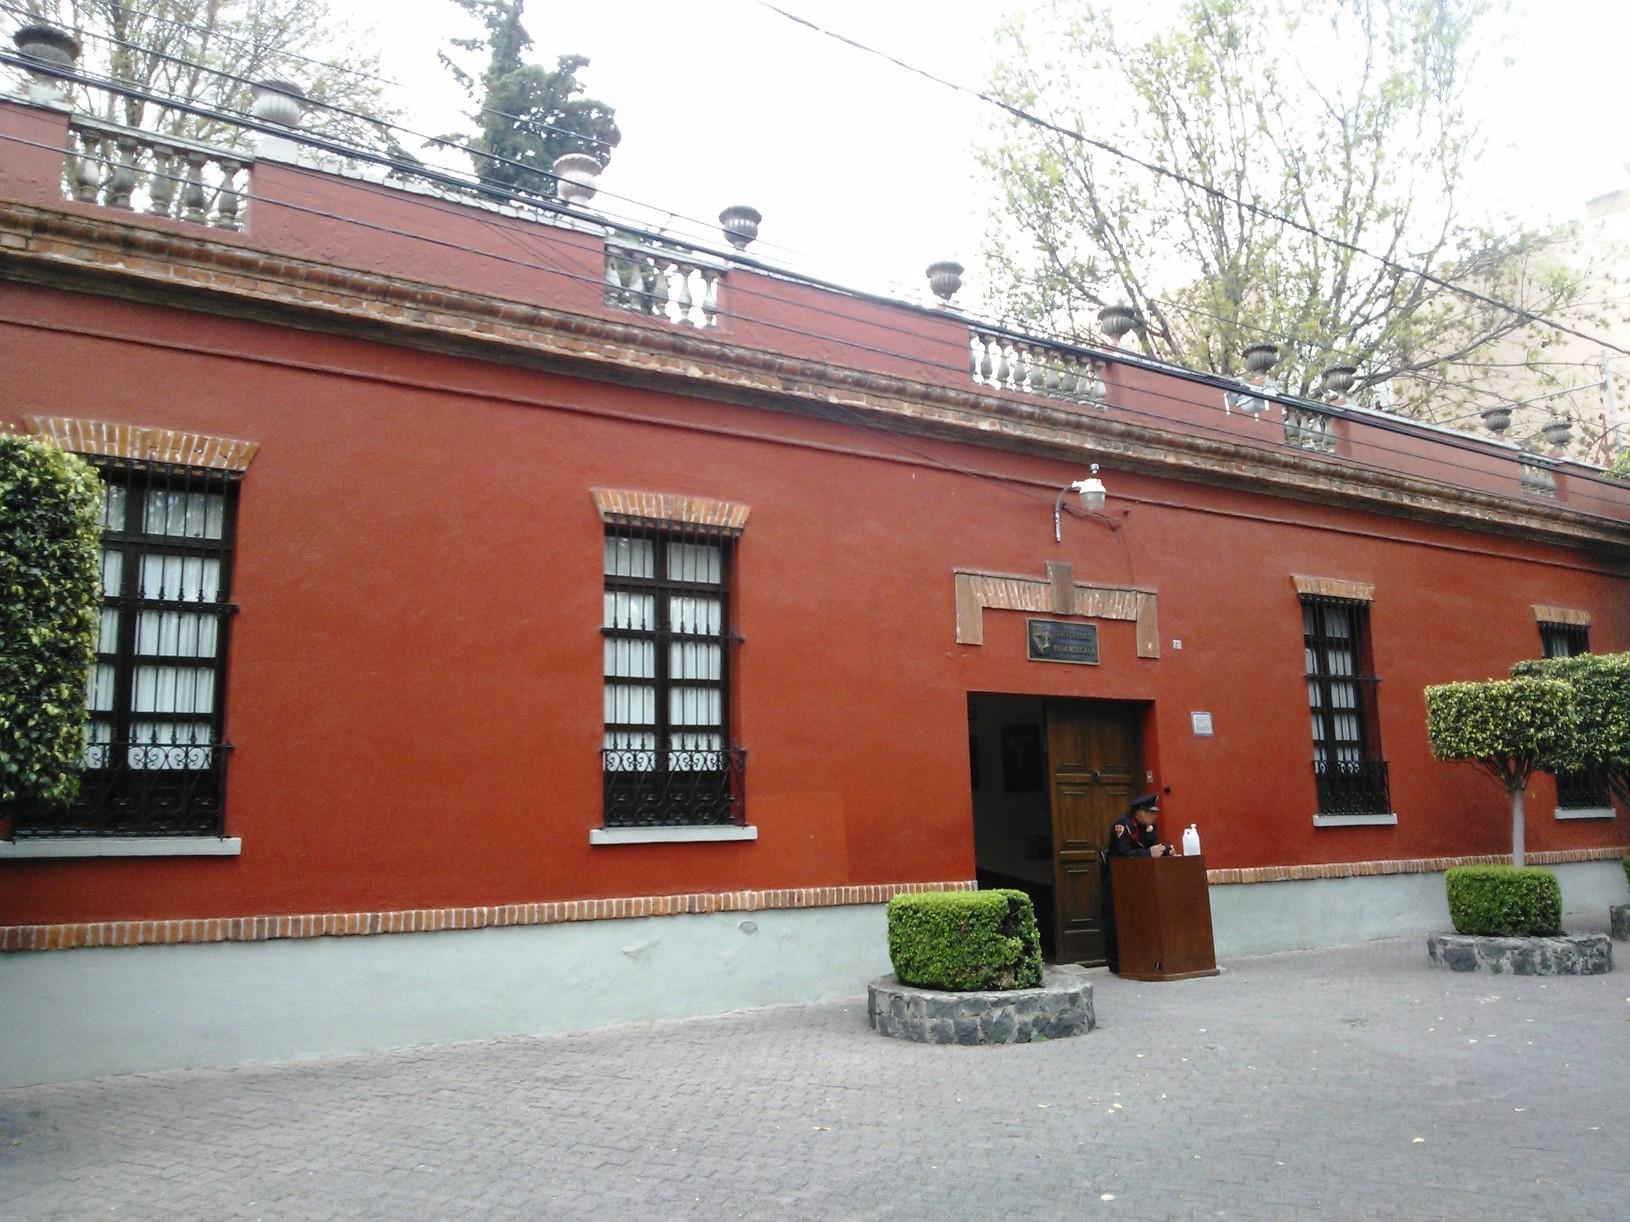 House of José Joaquín Fernandez de Lizardi.